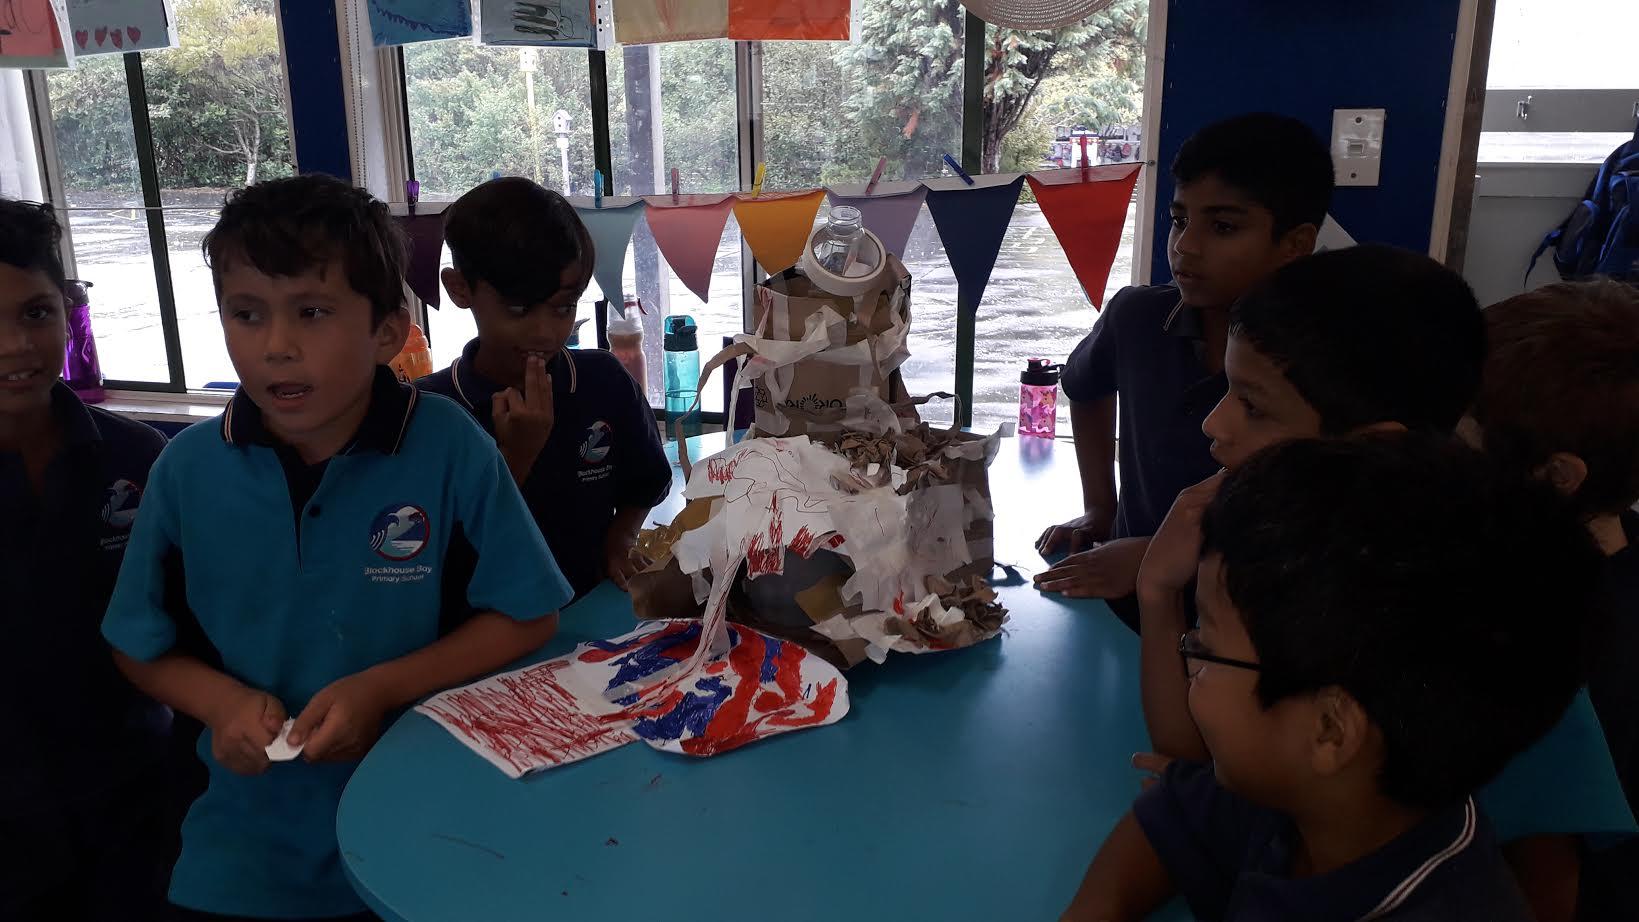 Blockhouse Bay Primary School - Tinkering with Volcanoes